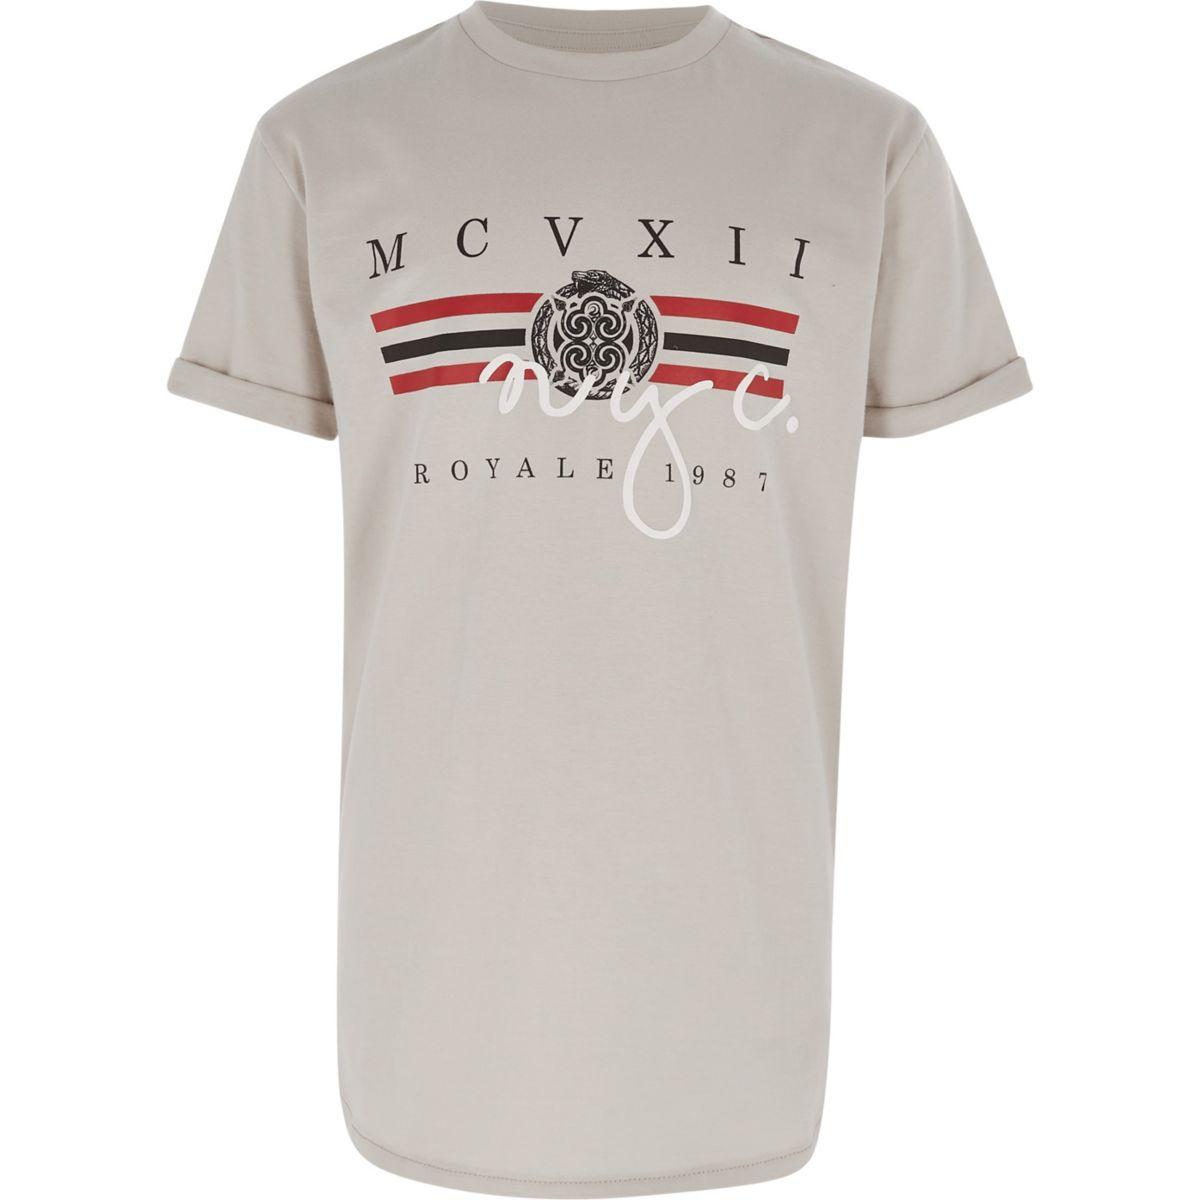 Boys stone 'NYC' print T-shirt